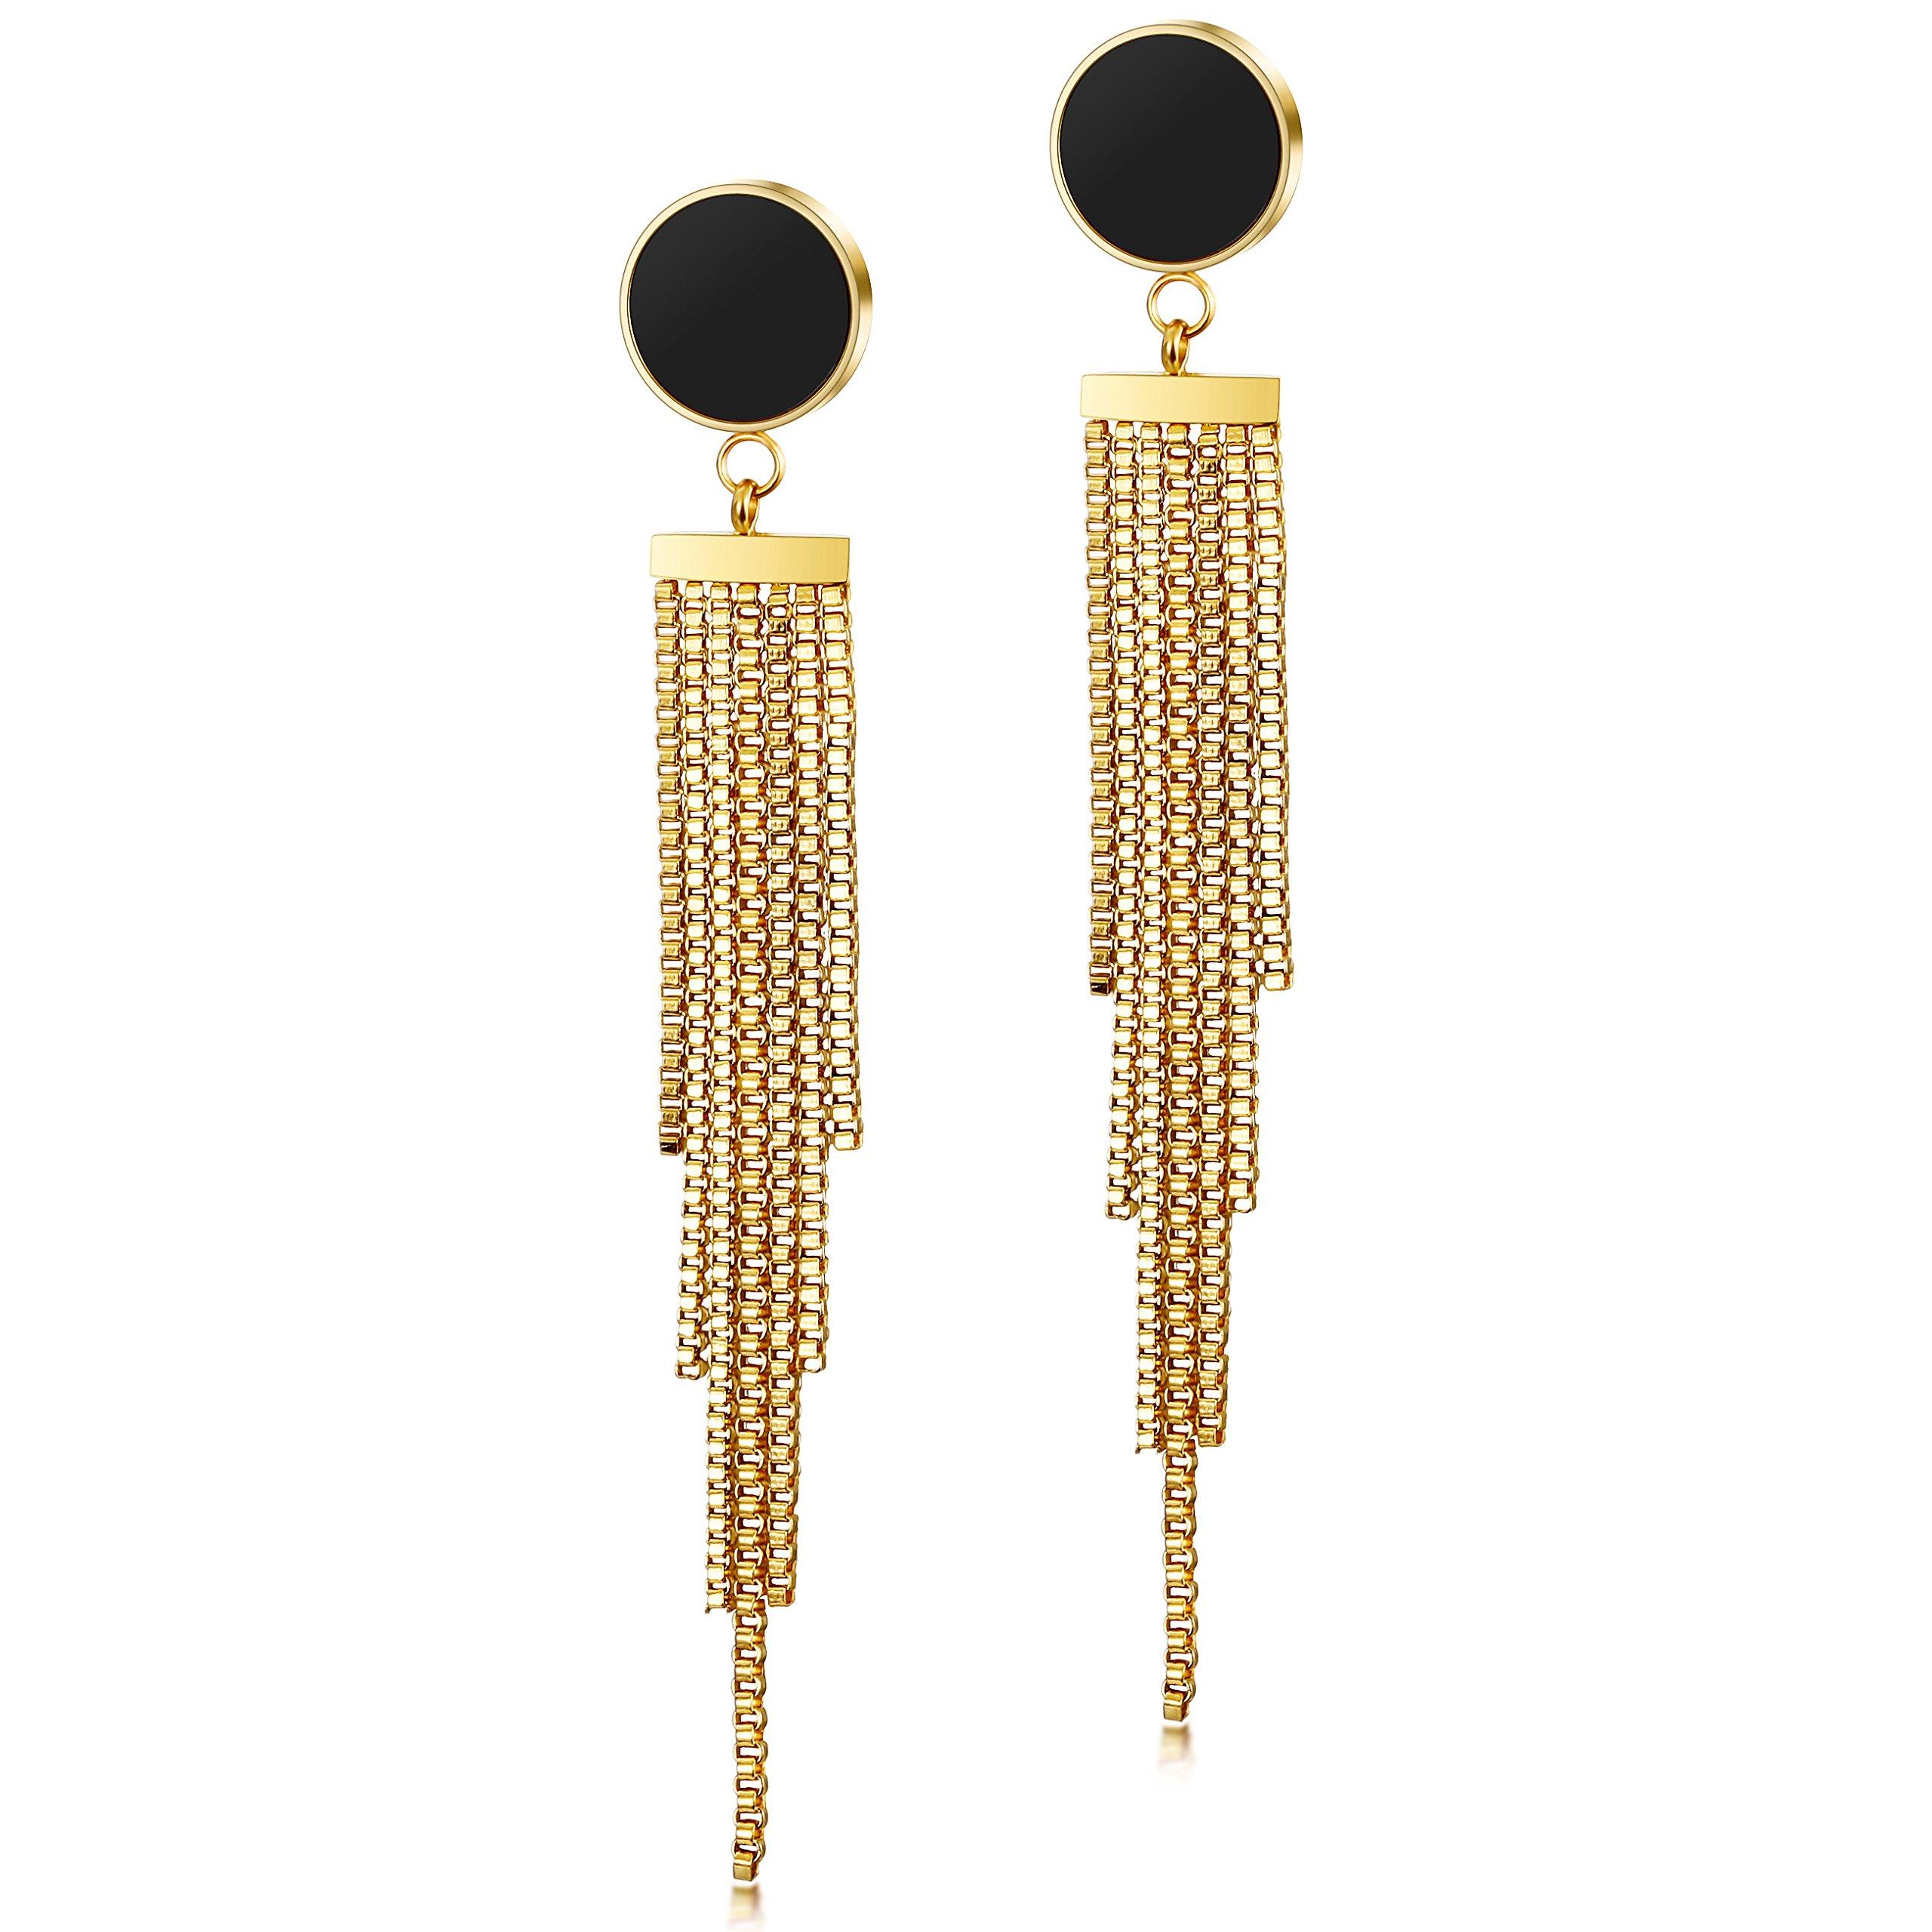 CIUNOFOR Tassel Earrings for Women Stainless SteelTiered Long Drop Earrings Hypoallergenic Dangle Gold Rose Gold Earrings